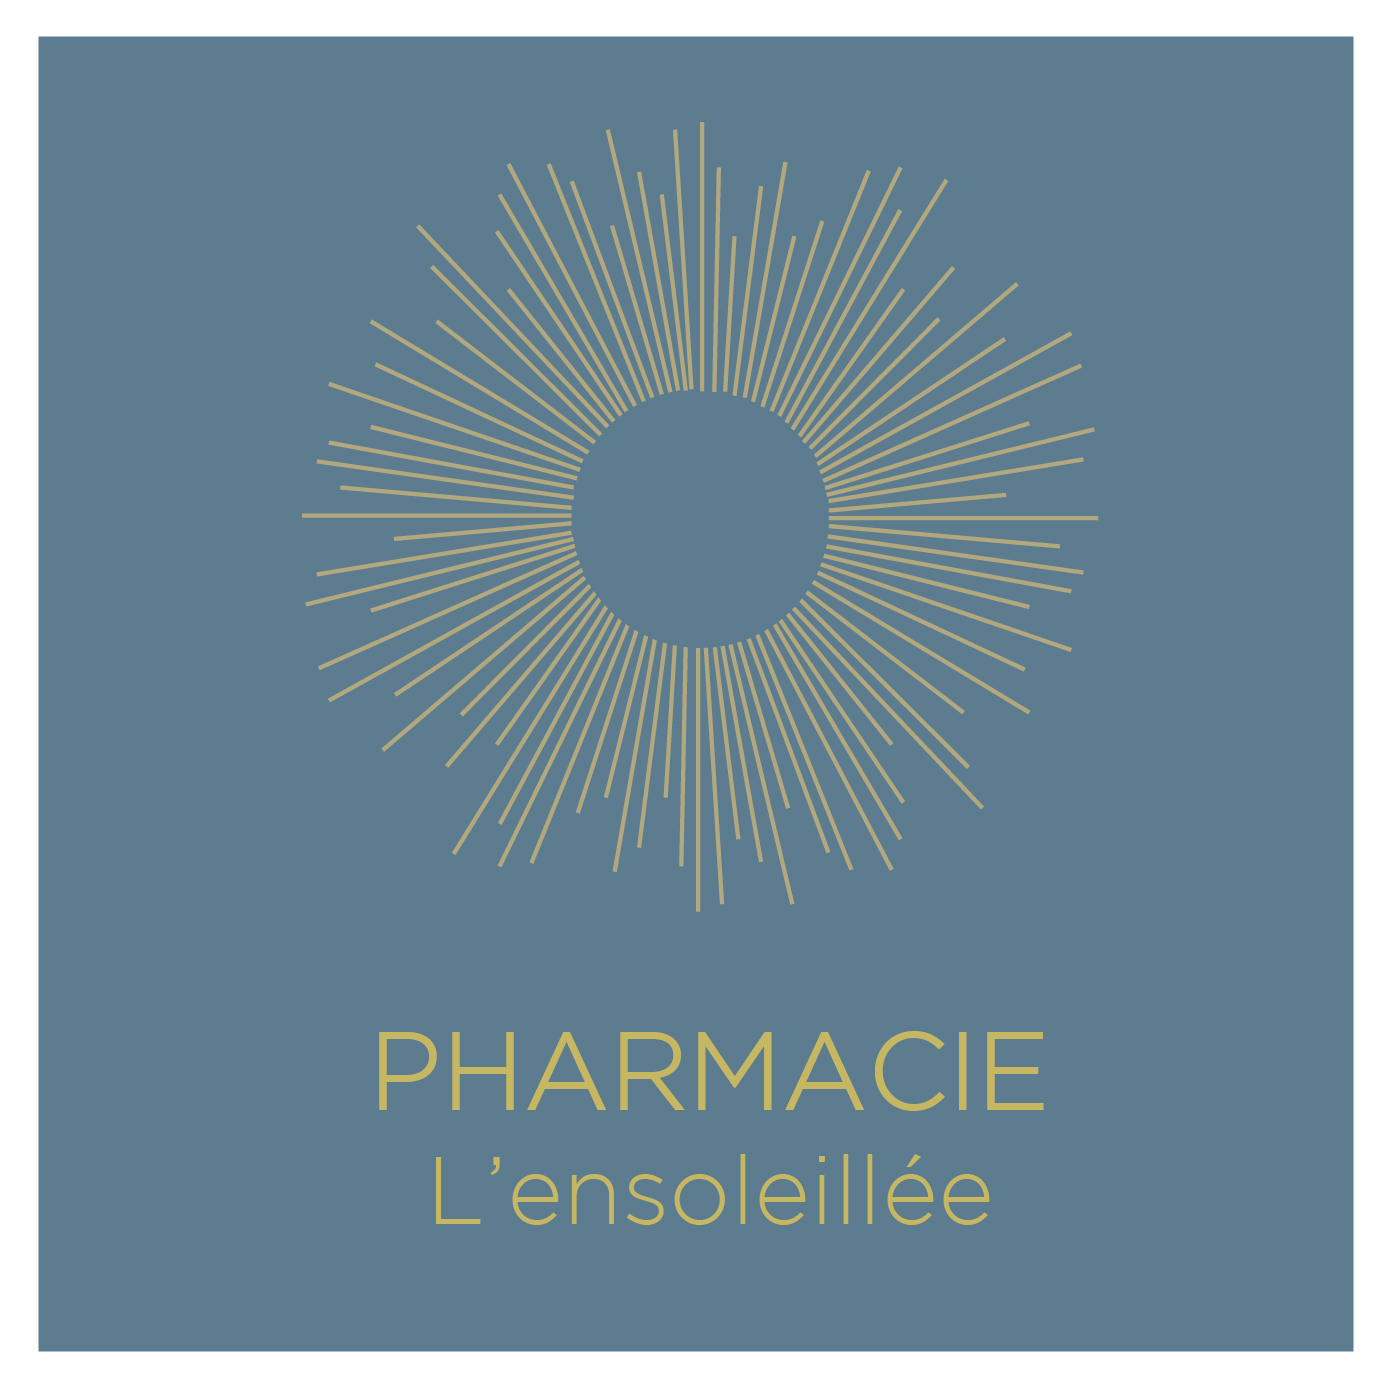 PHARMACIE L'ENSOLEILLEE –  AIX EN PROVENCE (13) 27